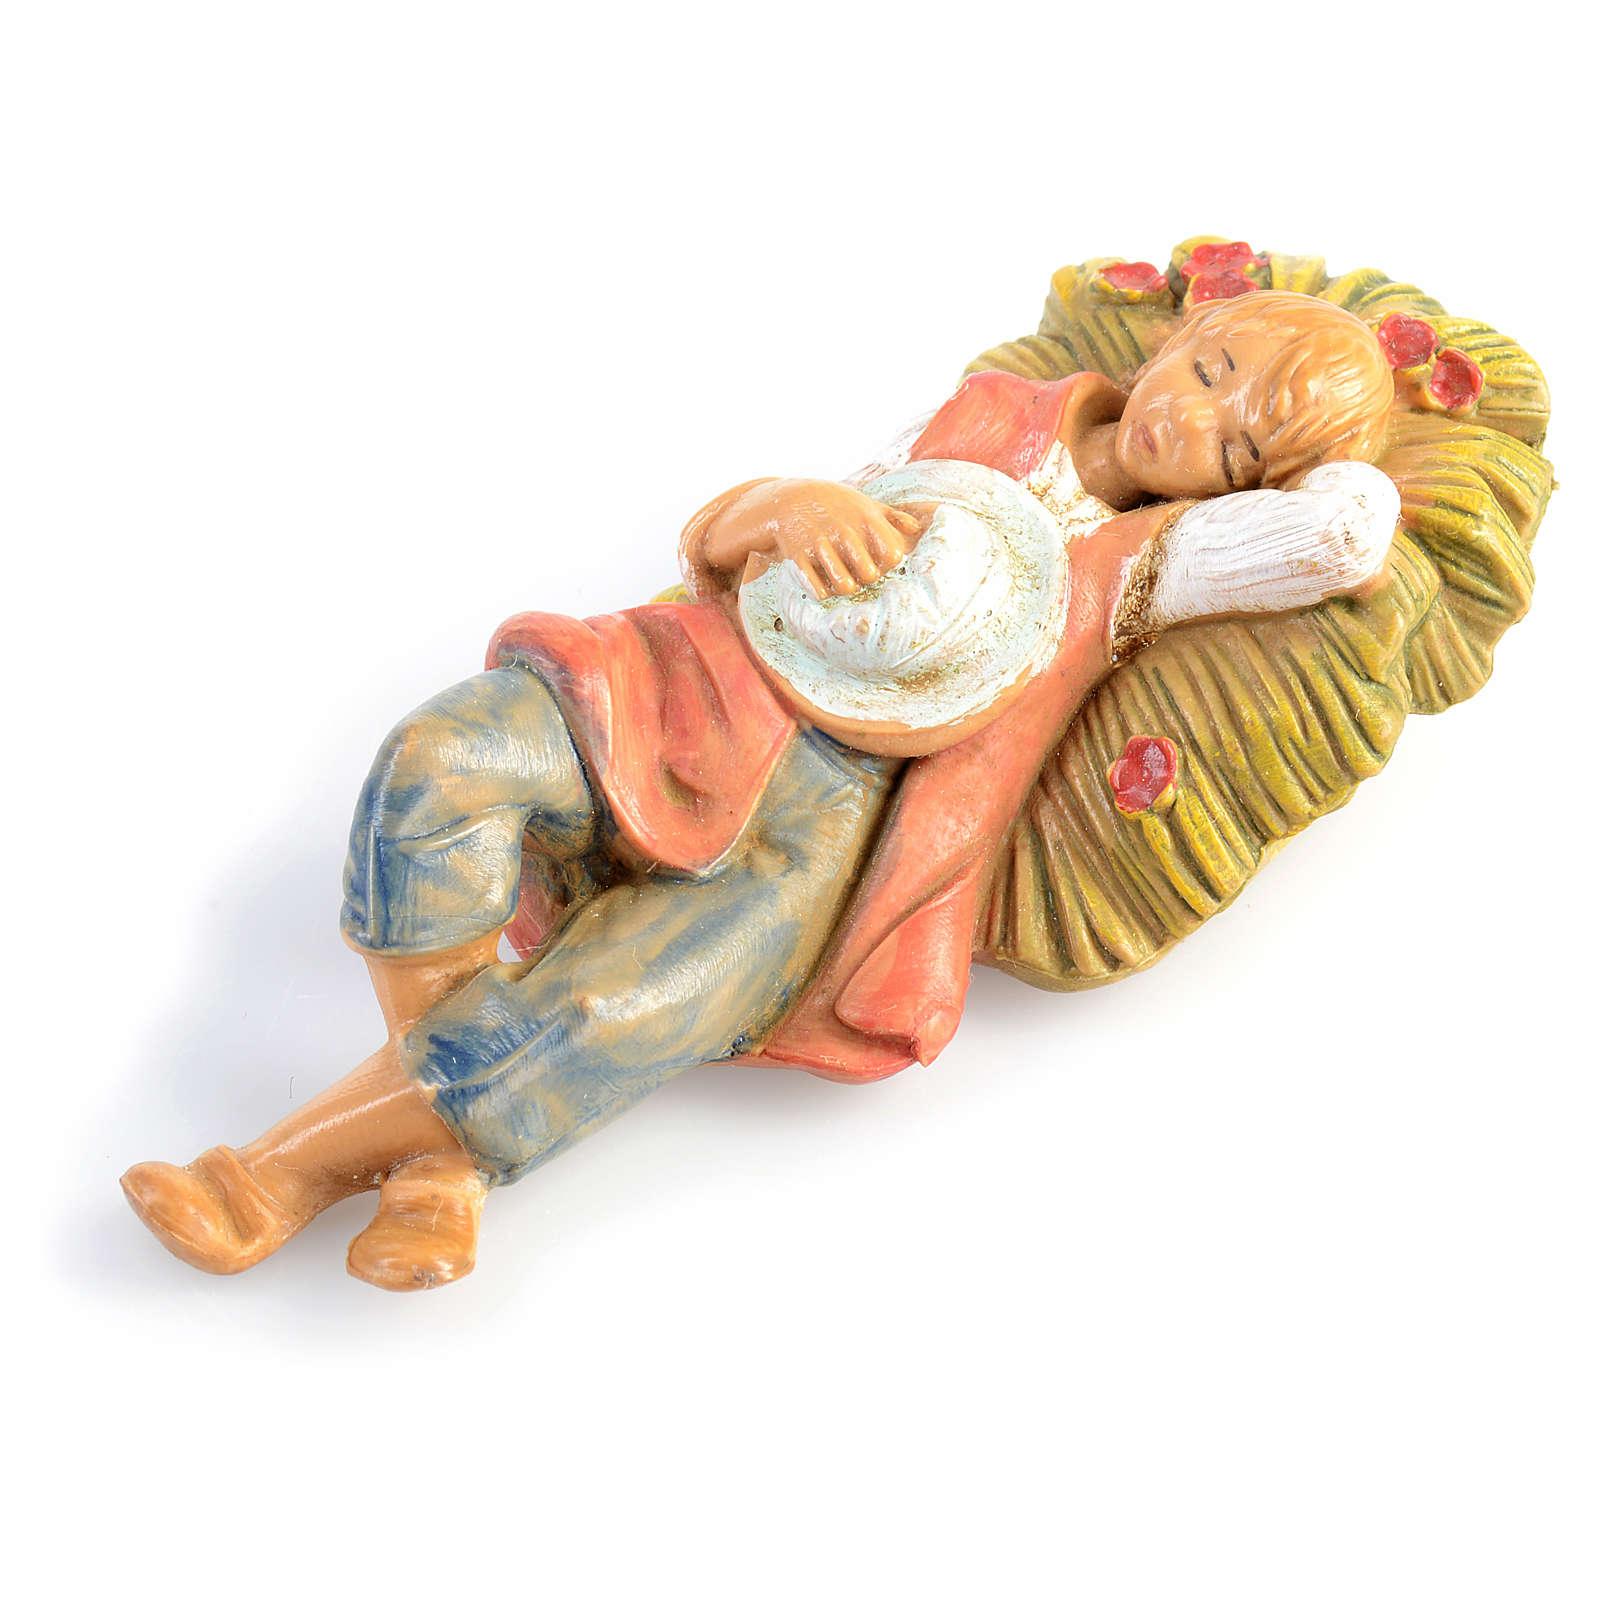 Garçon endormi crèche 6,5 cm Fontanini 4